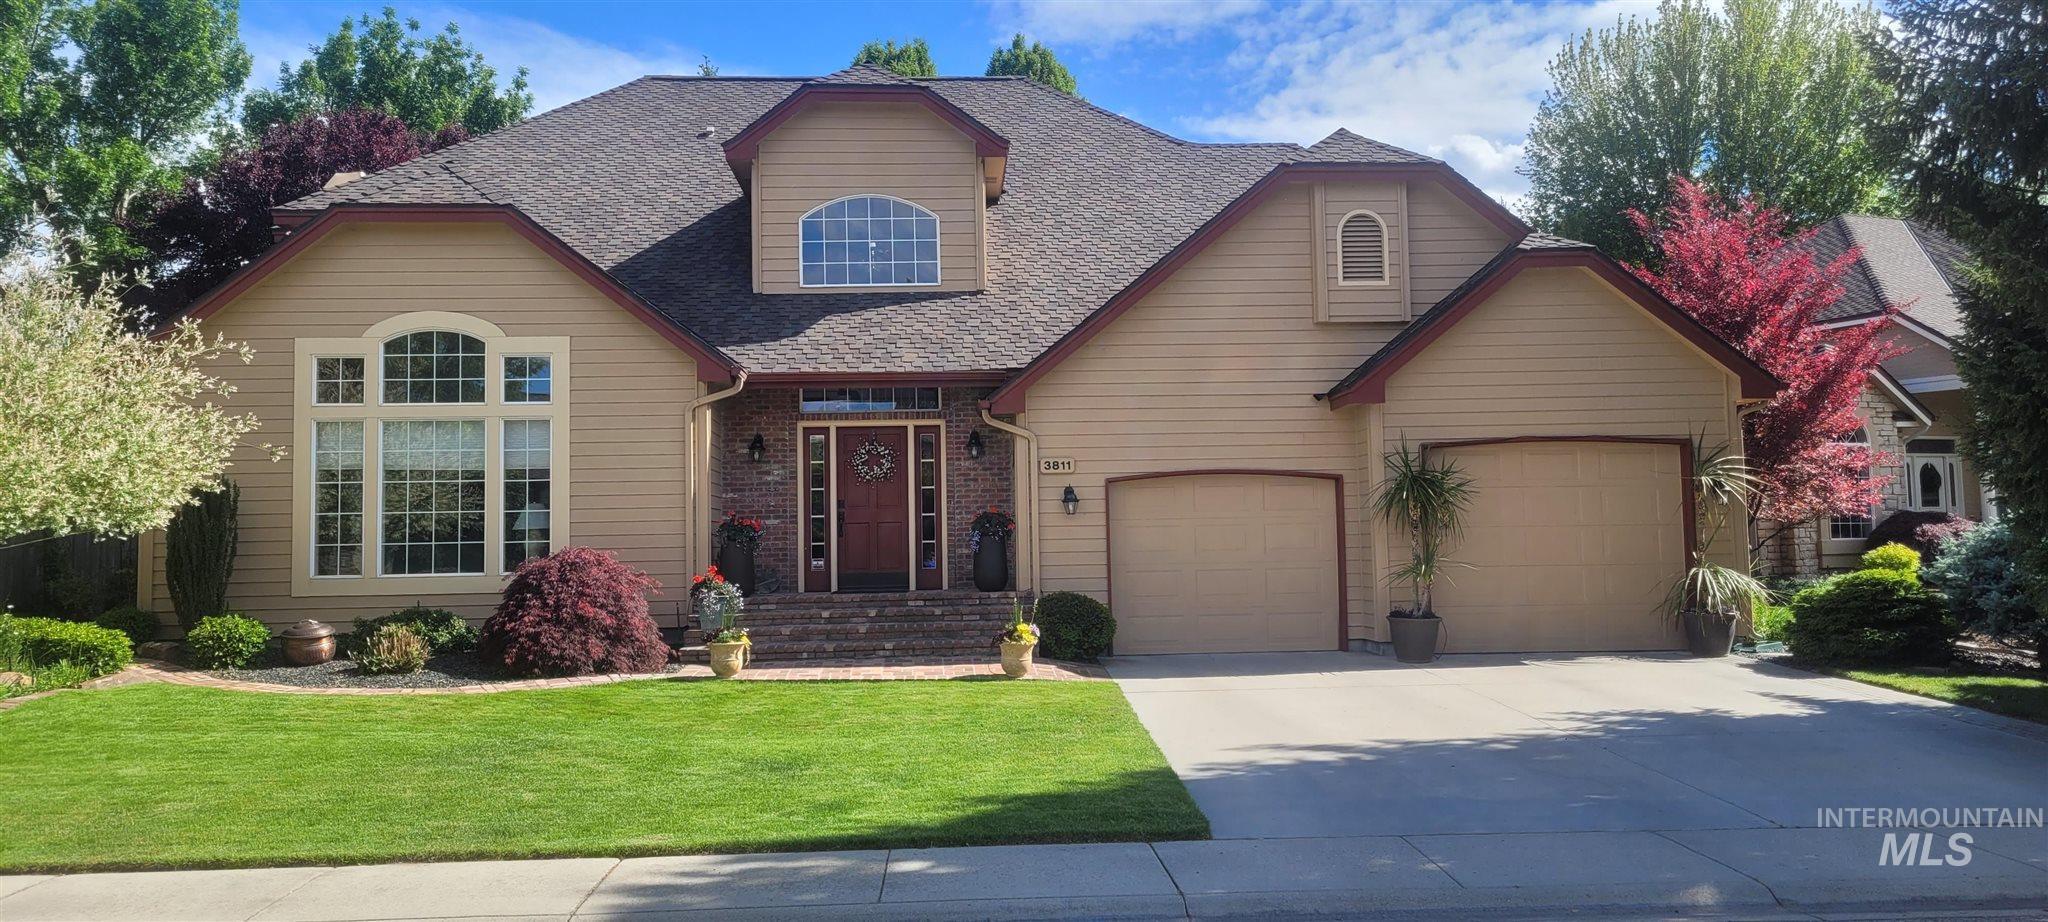 3811 S Suntree Property Photo 1